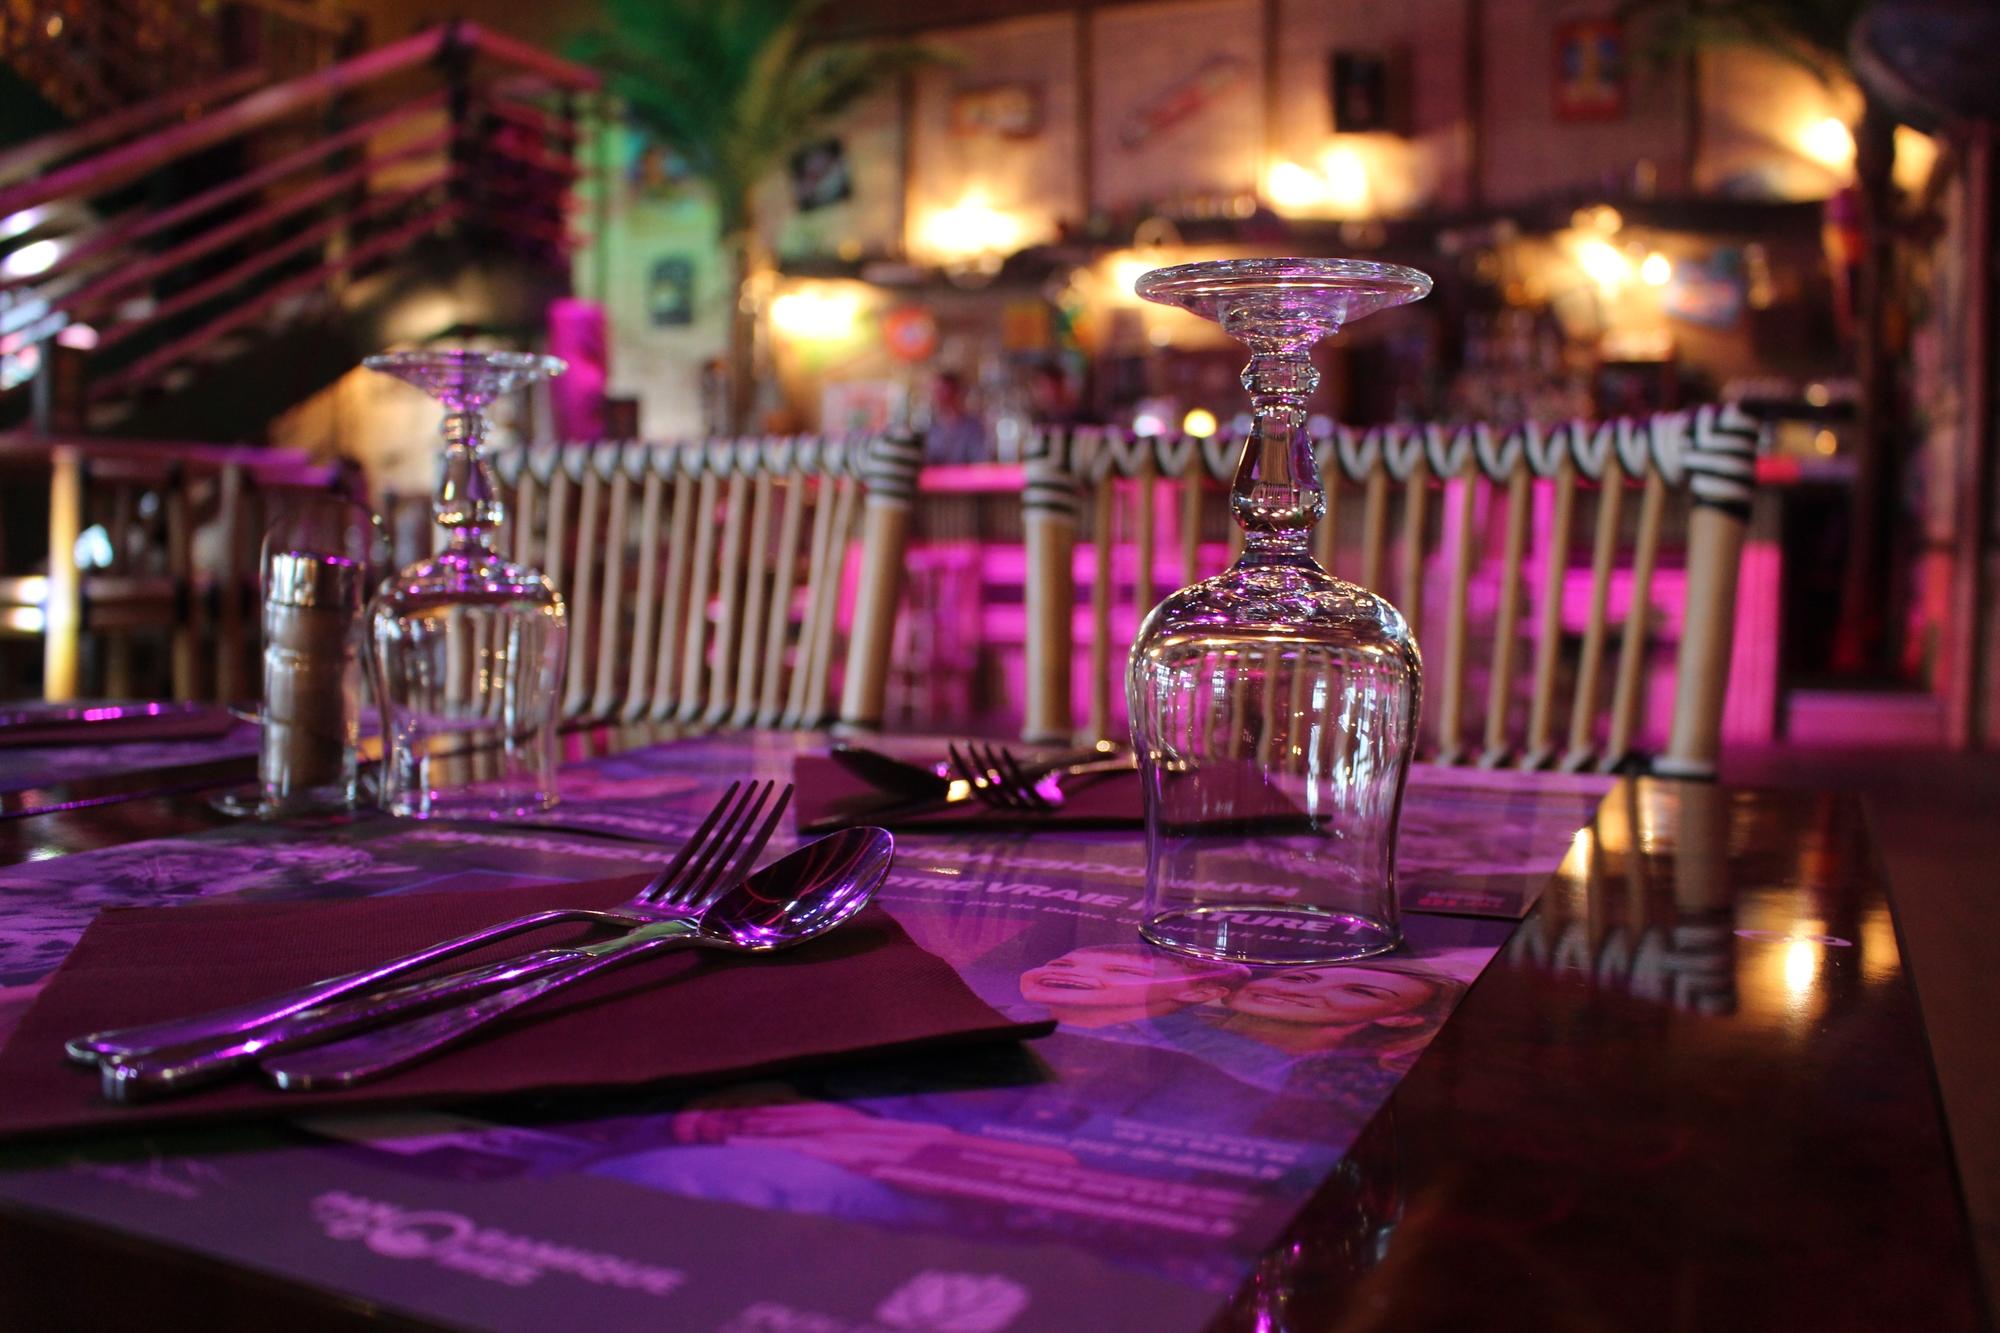 Restaurant Pu Pu Platter's – Mozac